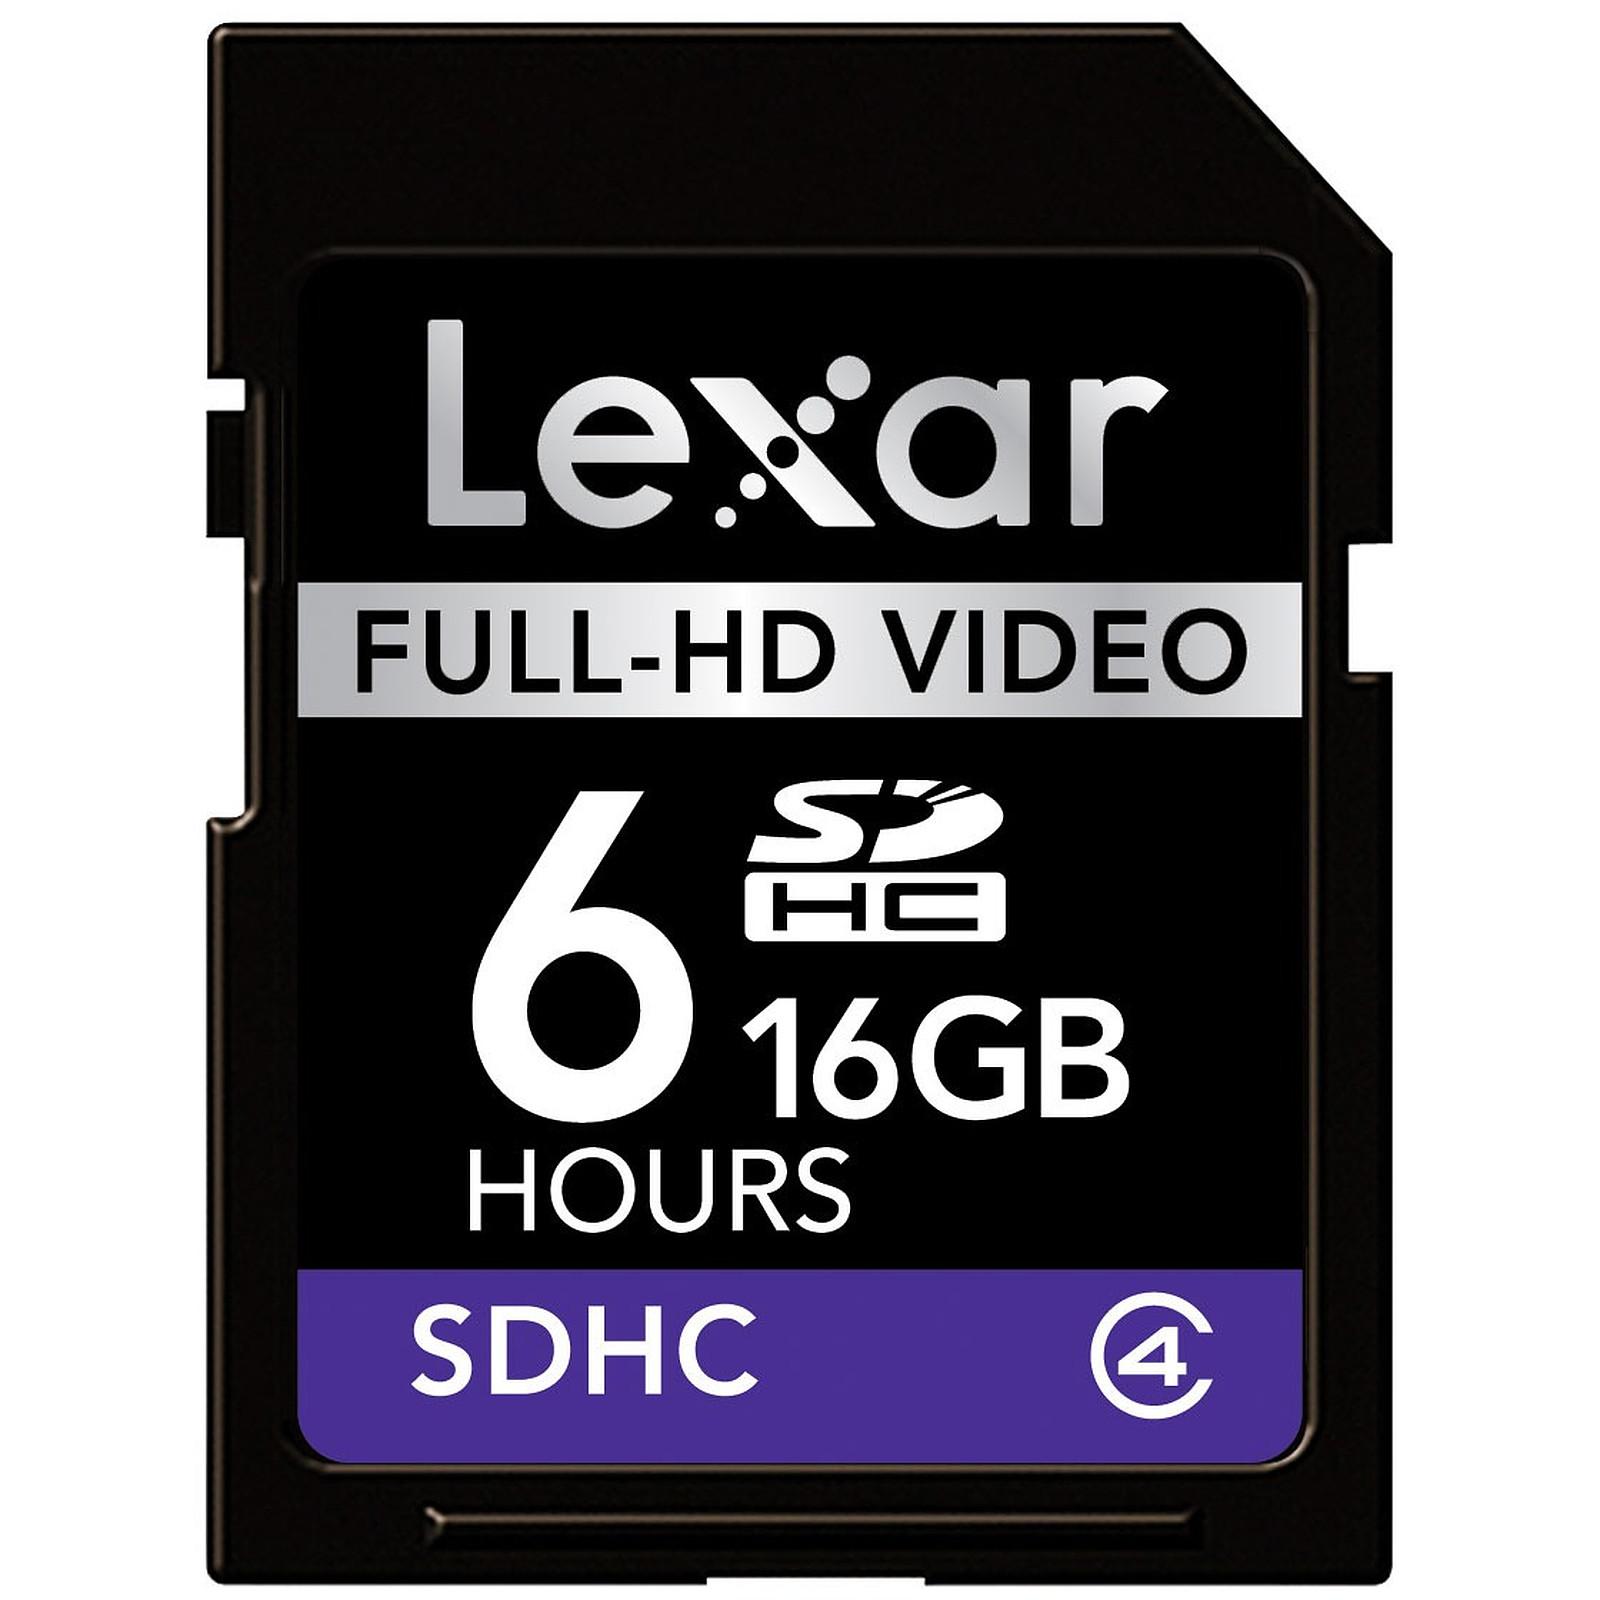 Lexar Carte SDHC Full-HD Video - 16 Go